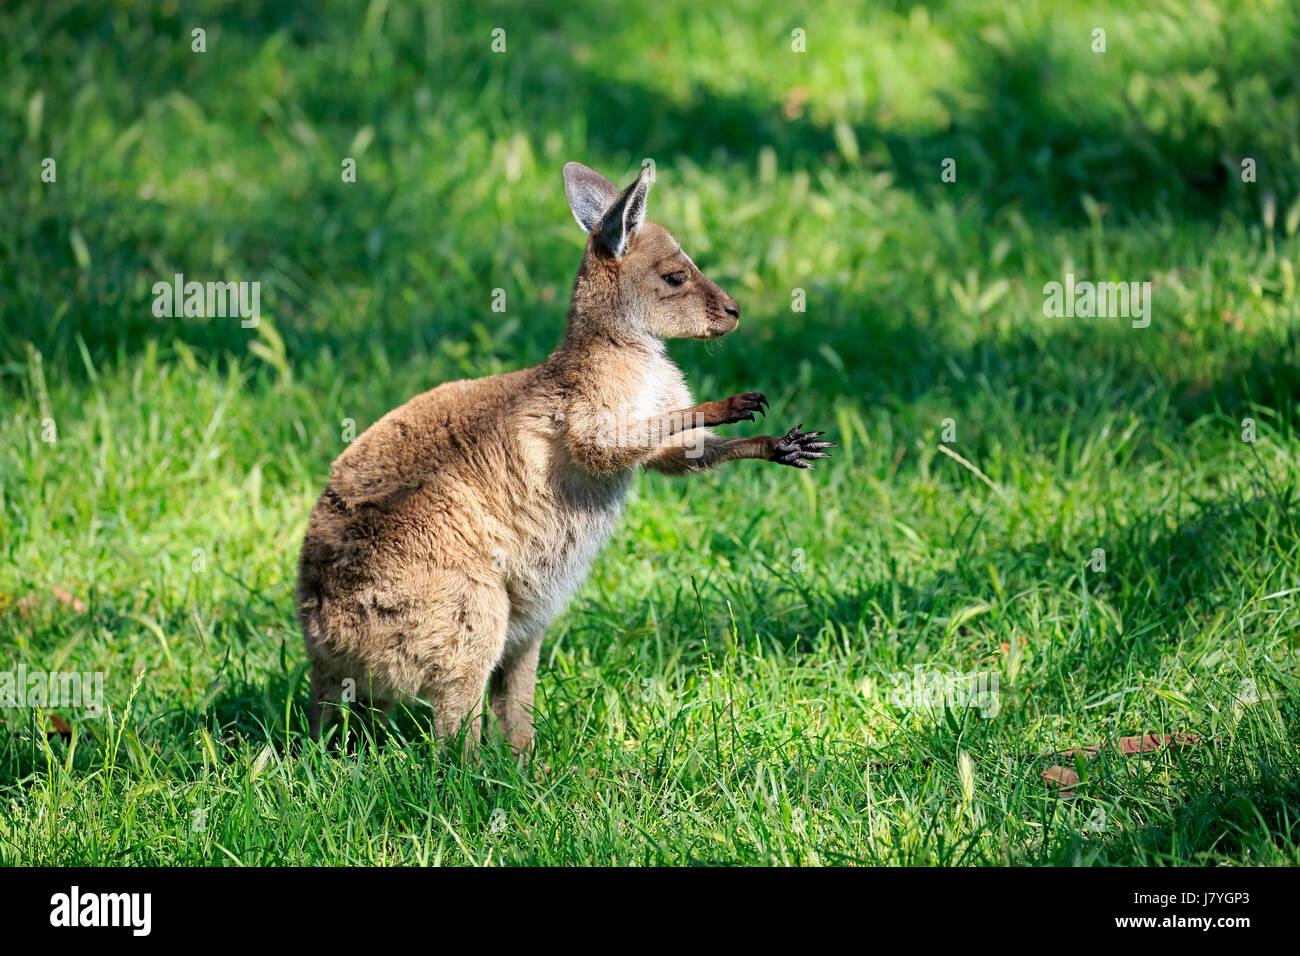 Eastern Gray Kangaroo (Macropus giganteus), young animal in a meadow, Mount Lofty, South Australia, Australia - Stock Image